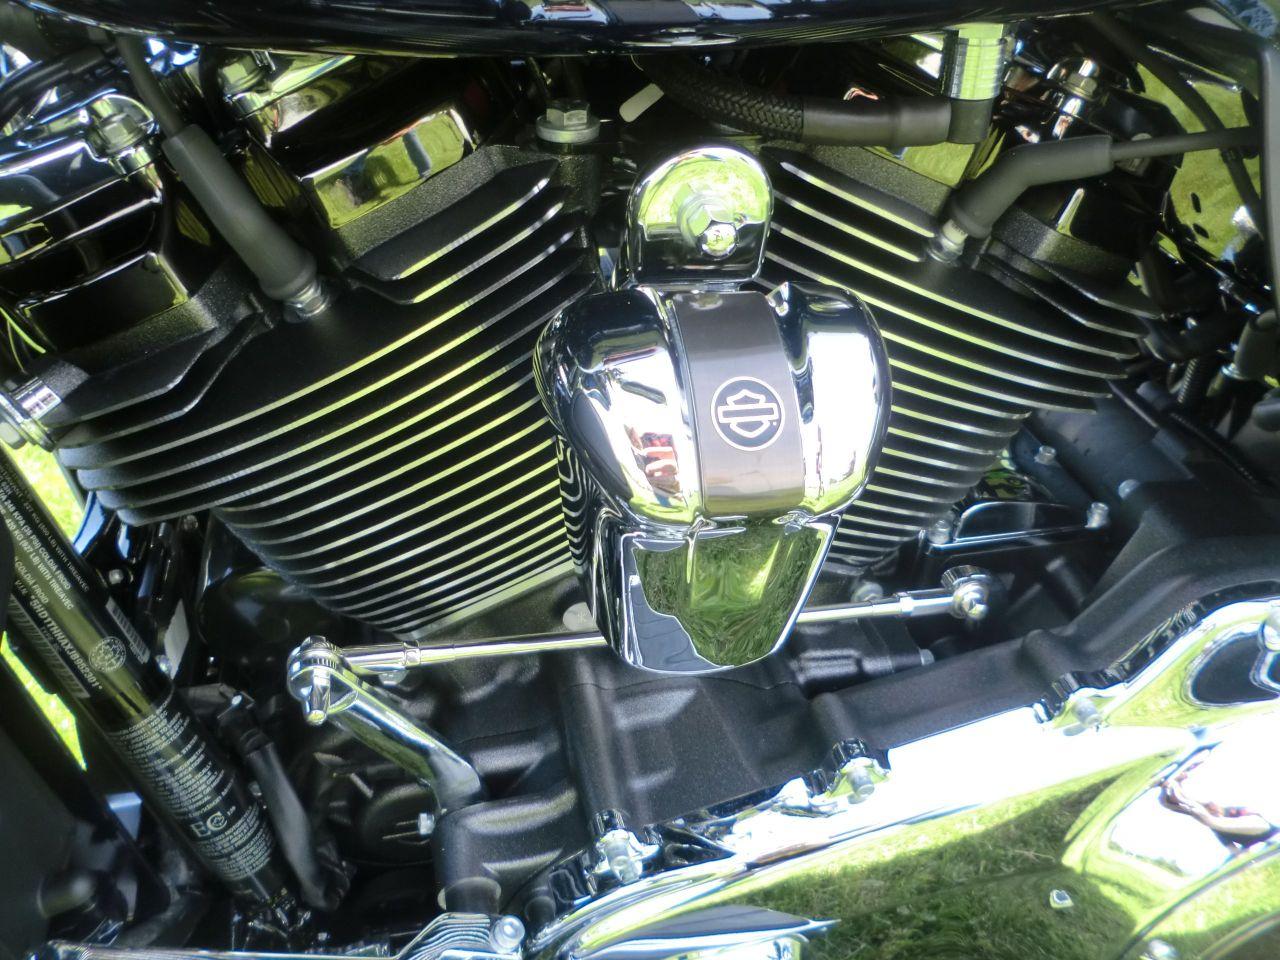 2018 Harley-Davidson CVO